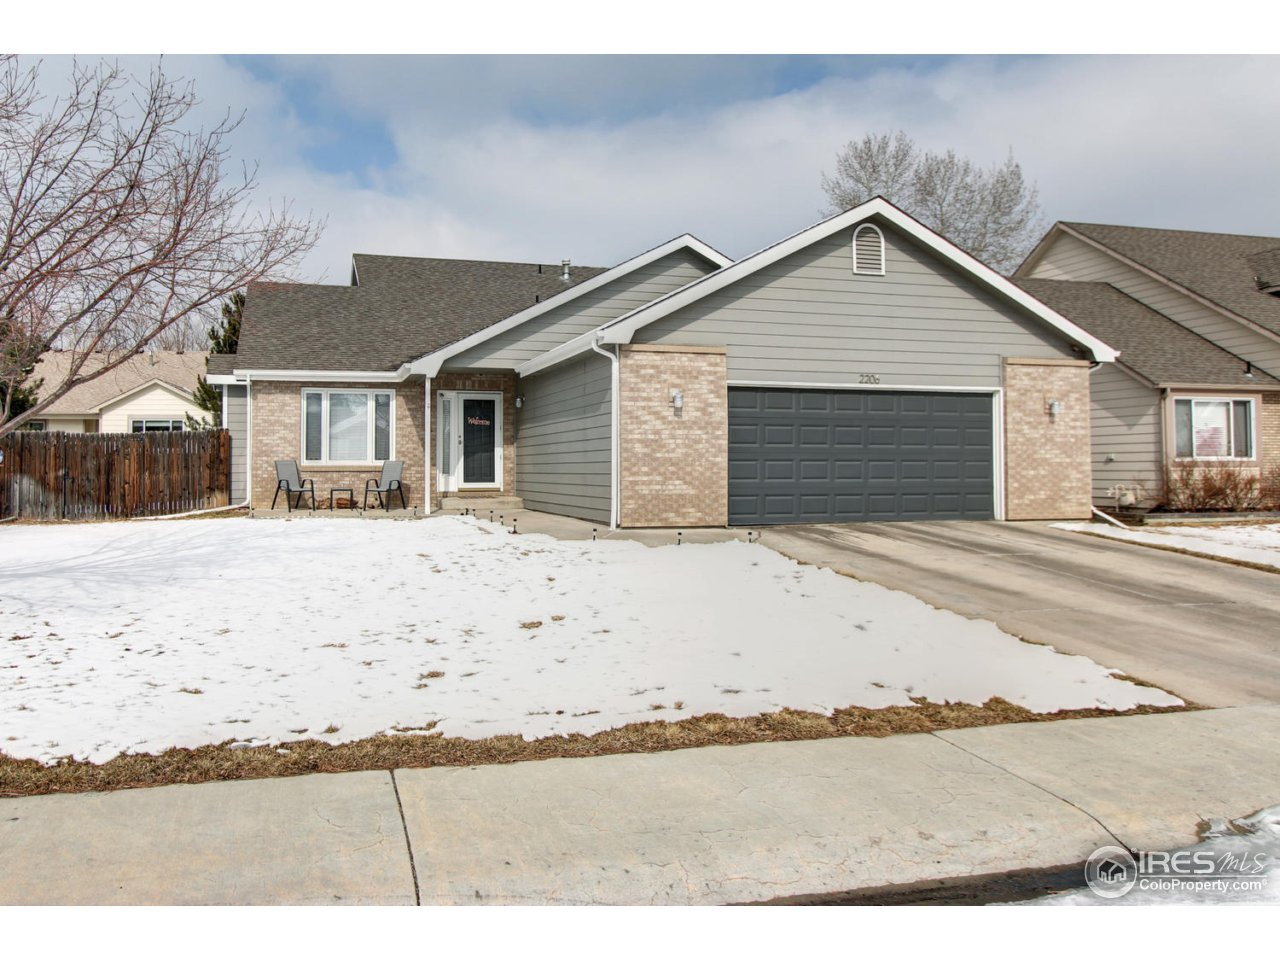 2206 Bronson St, Fort Collins CO 80526